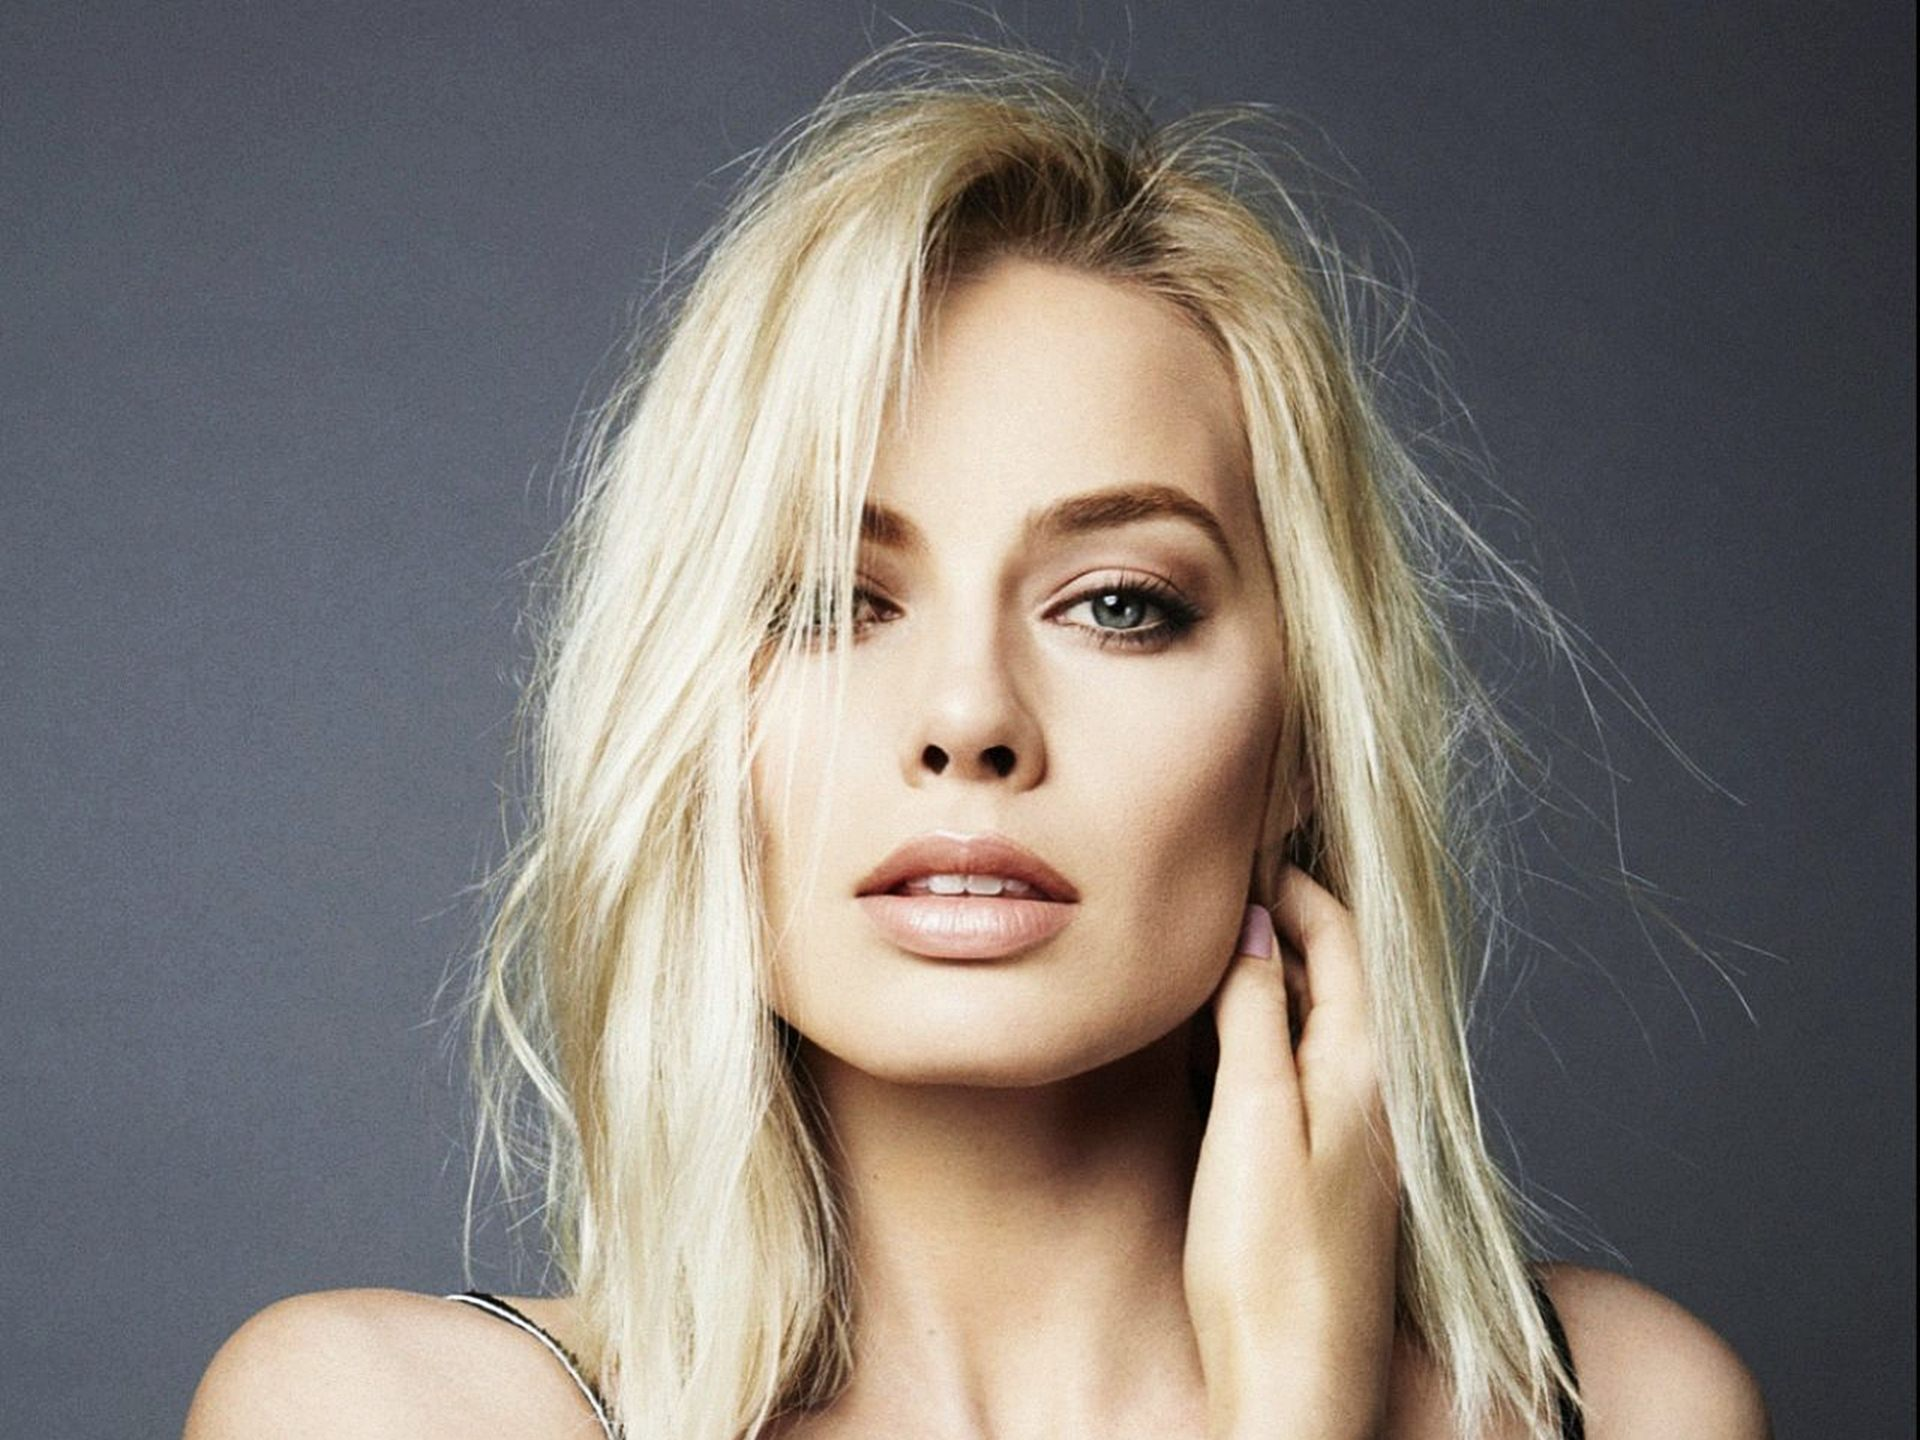 Margot Robbie 1403517 Hd Wallpaper Backgrounds Download